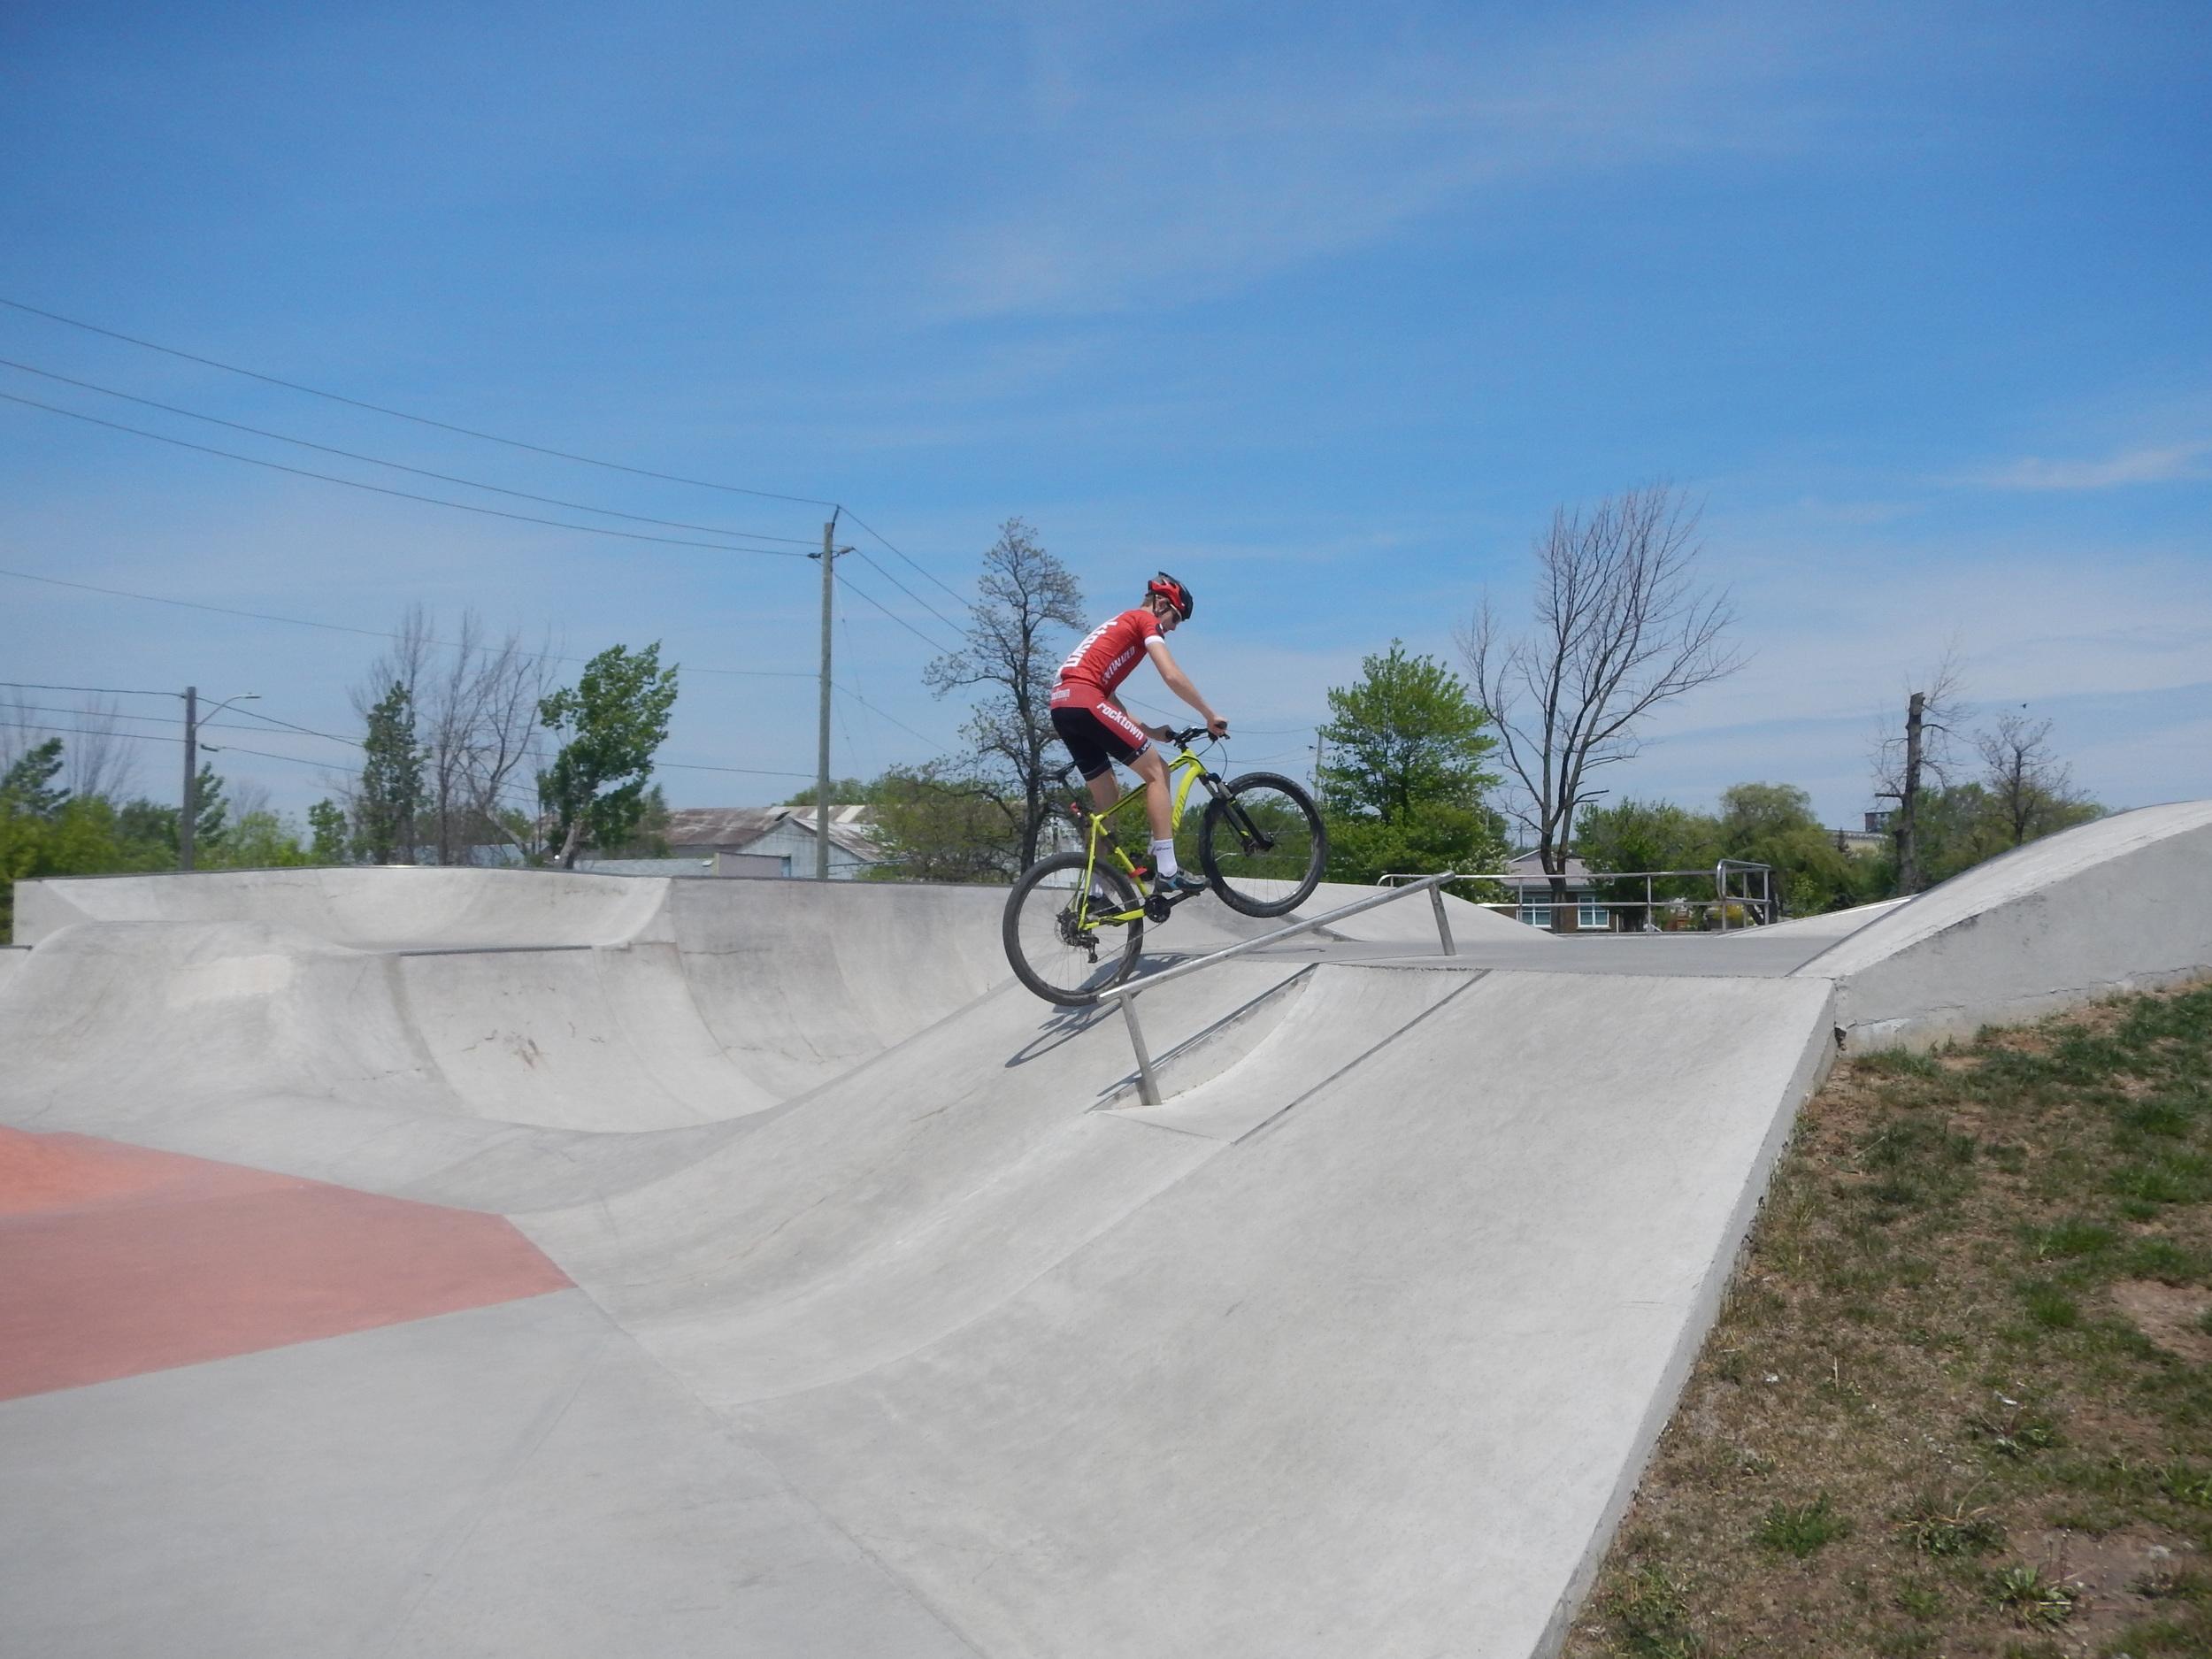 We found a skate park!